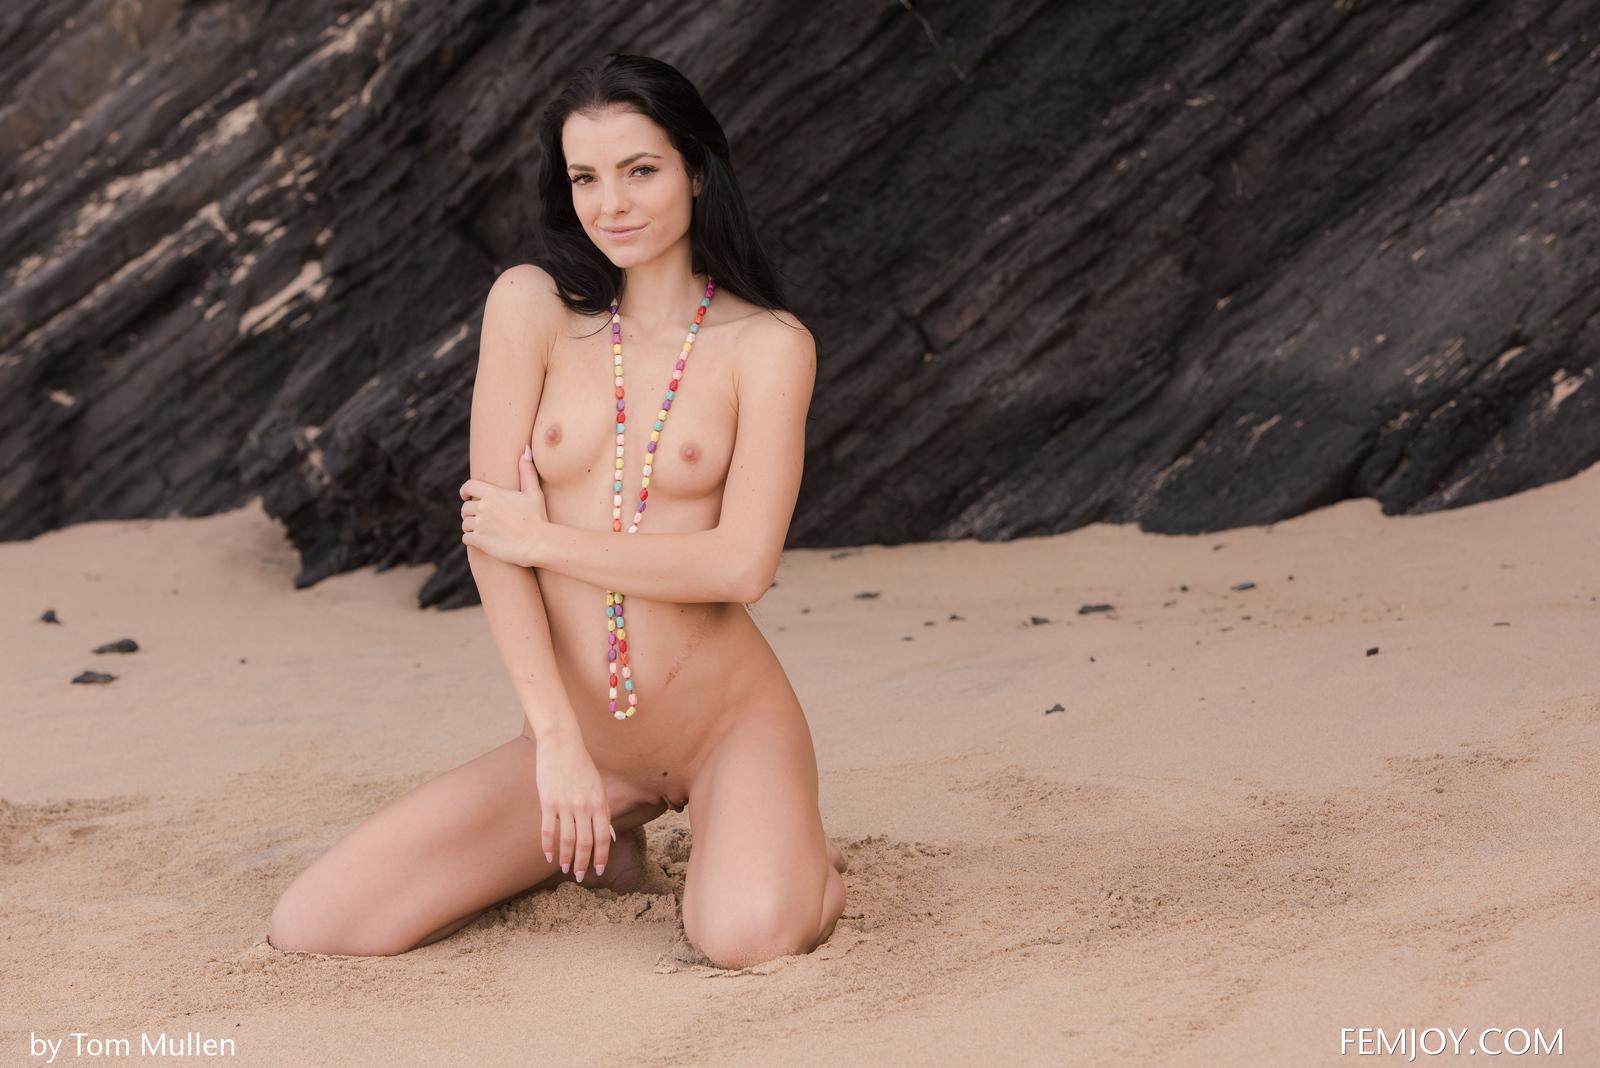 sapphira-brunette-beach-naked-bikini-seaside-femjoy-22